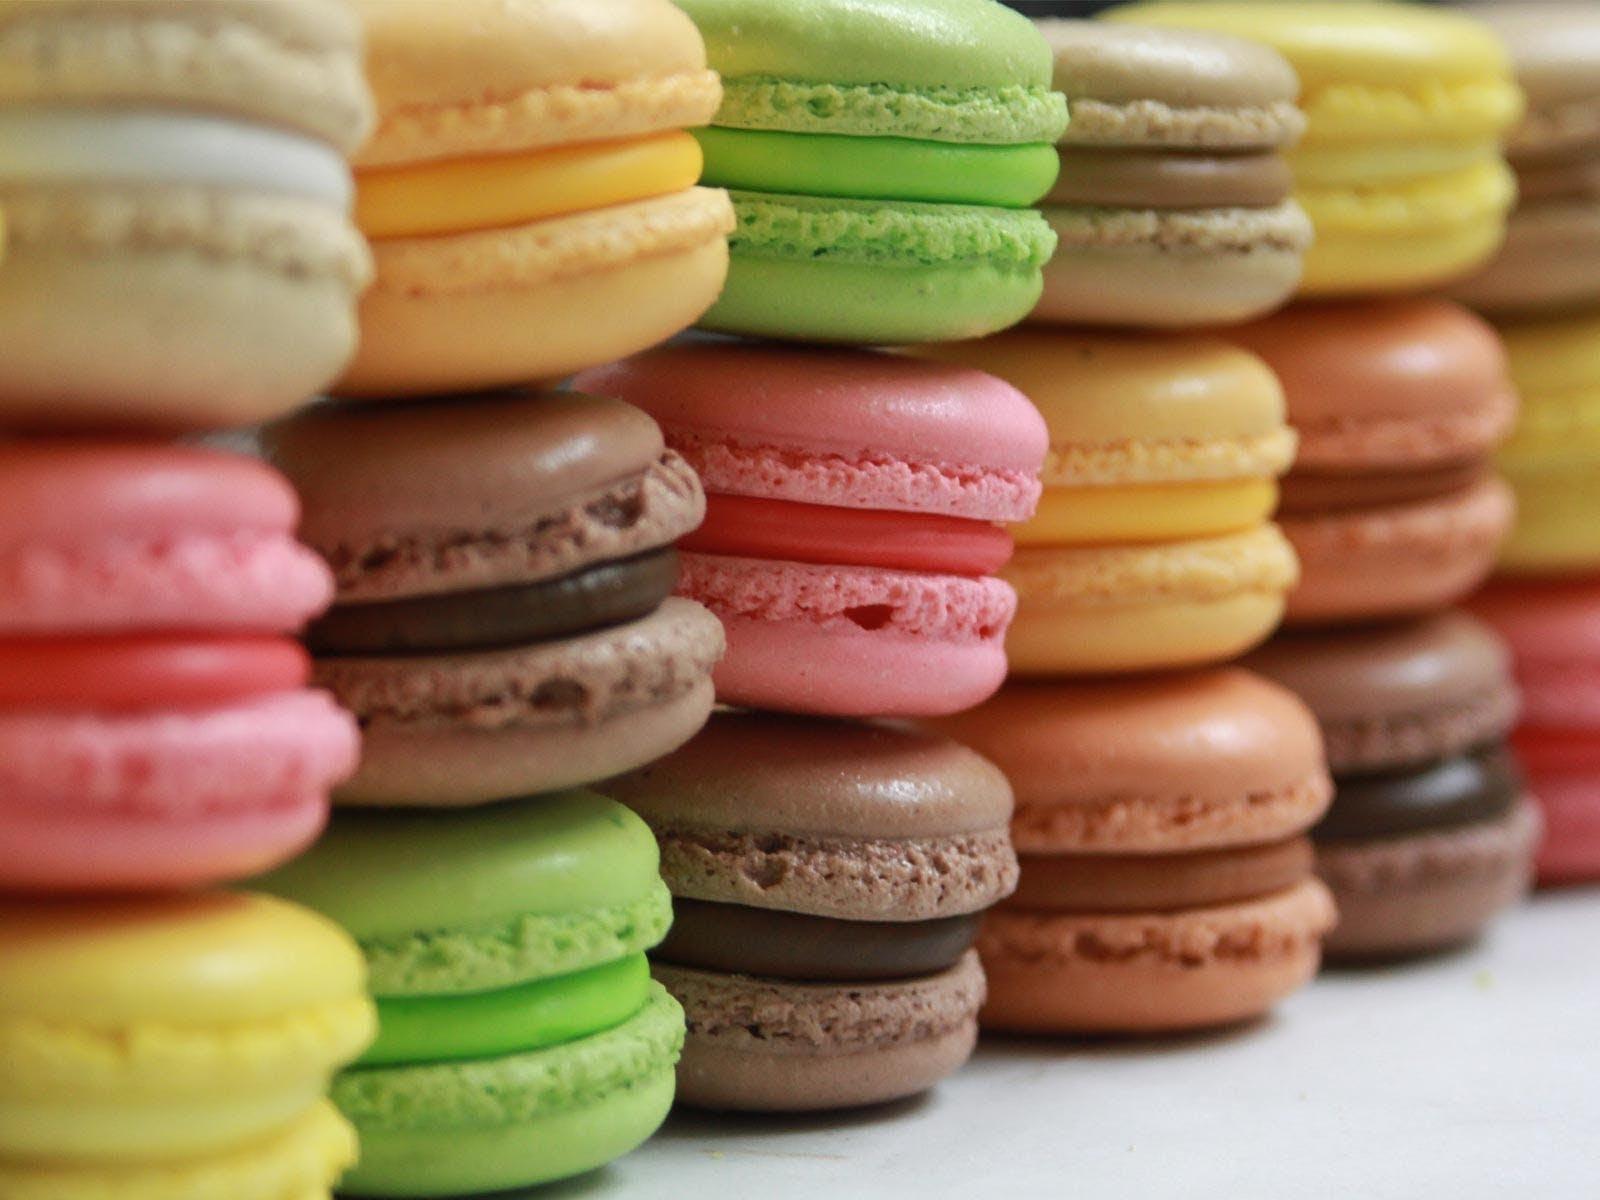 Baking Class: Macarons